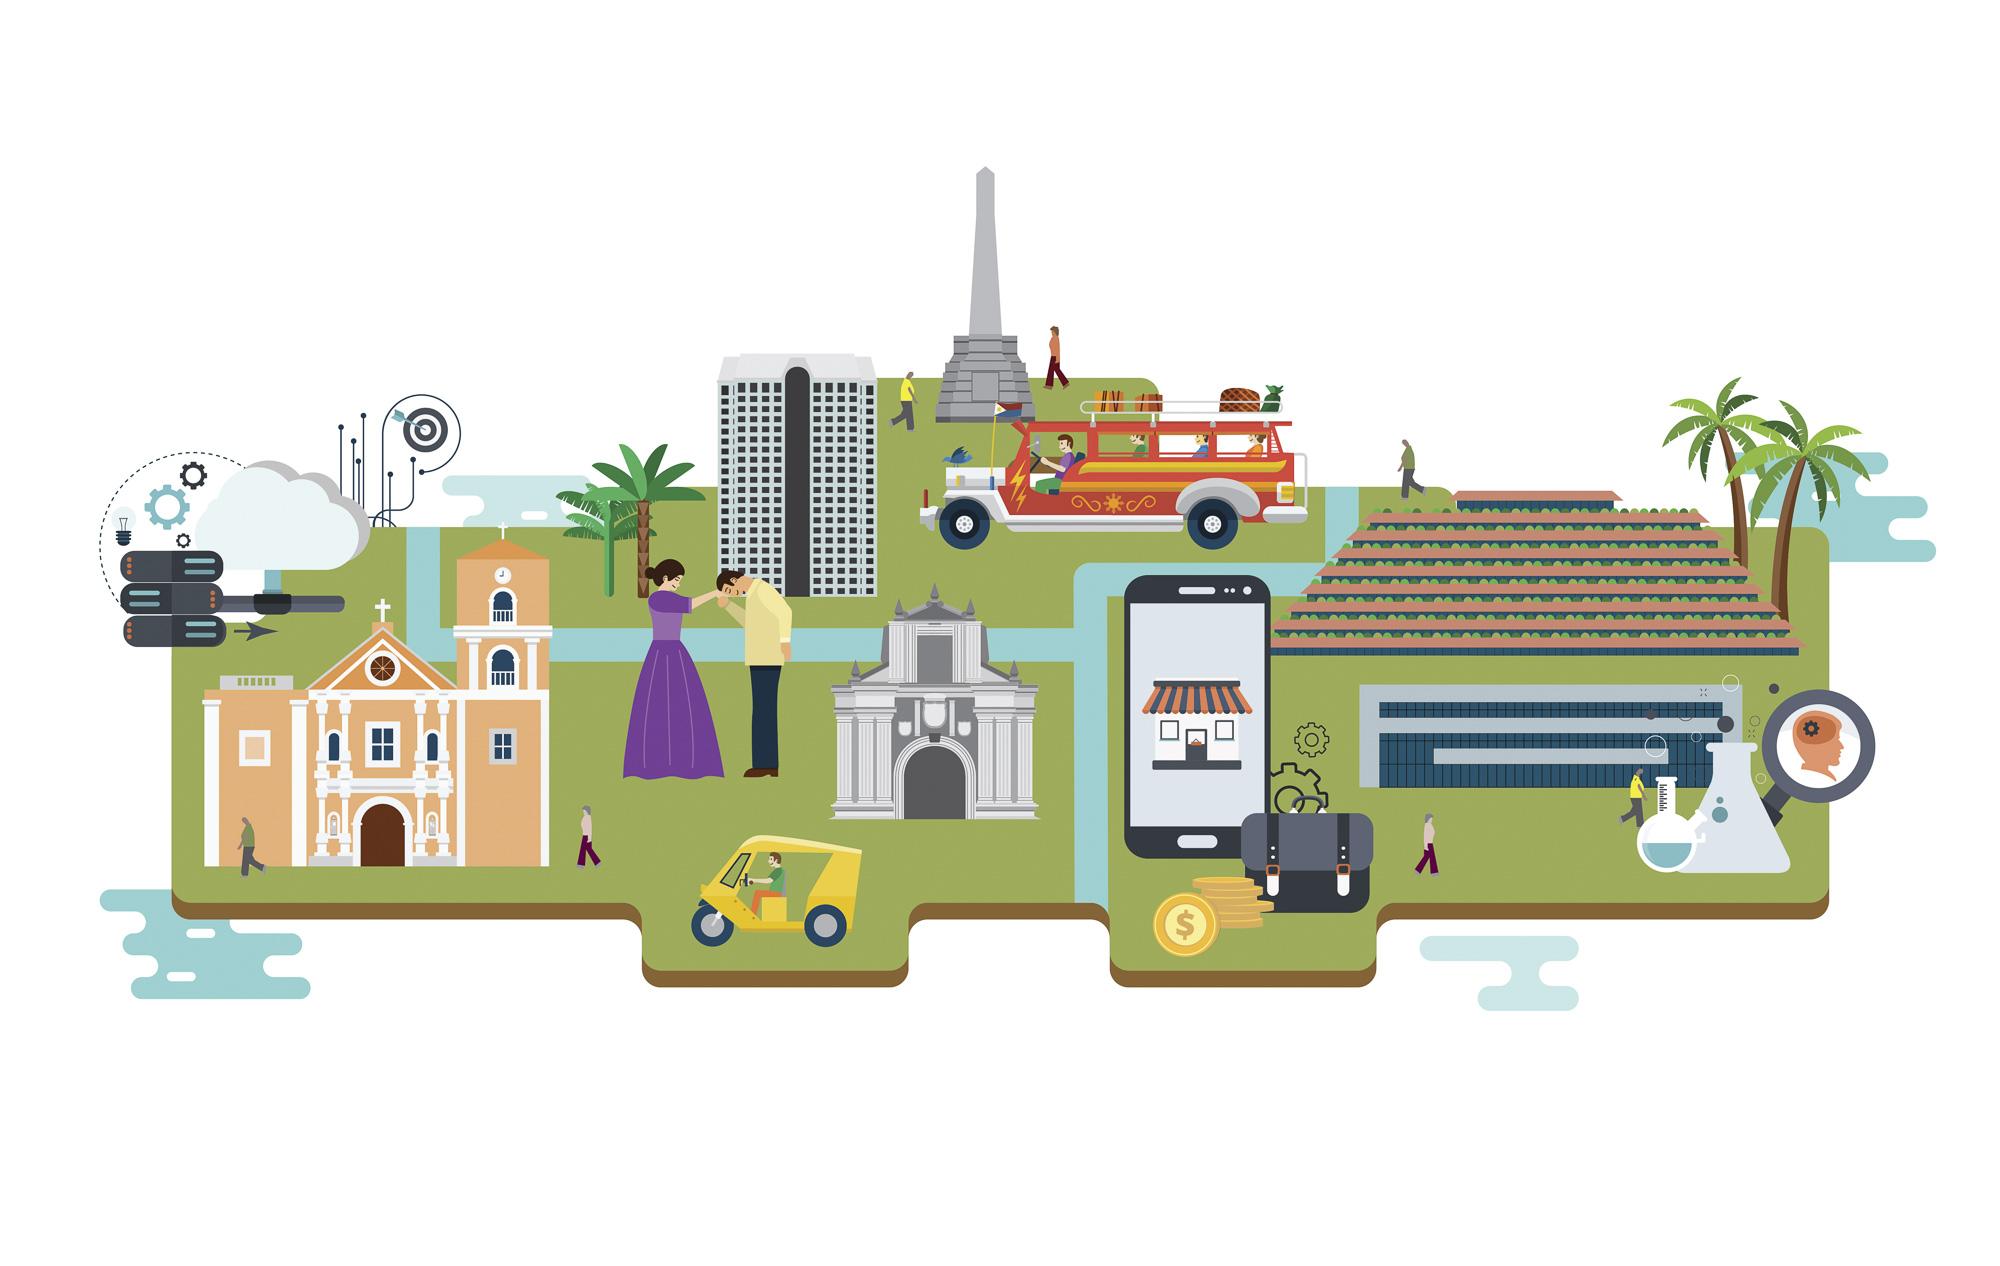 Manila: Asia's next tech hub?